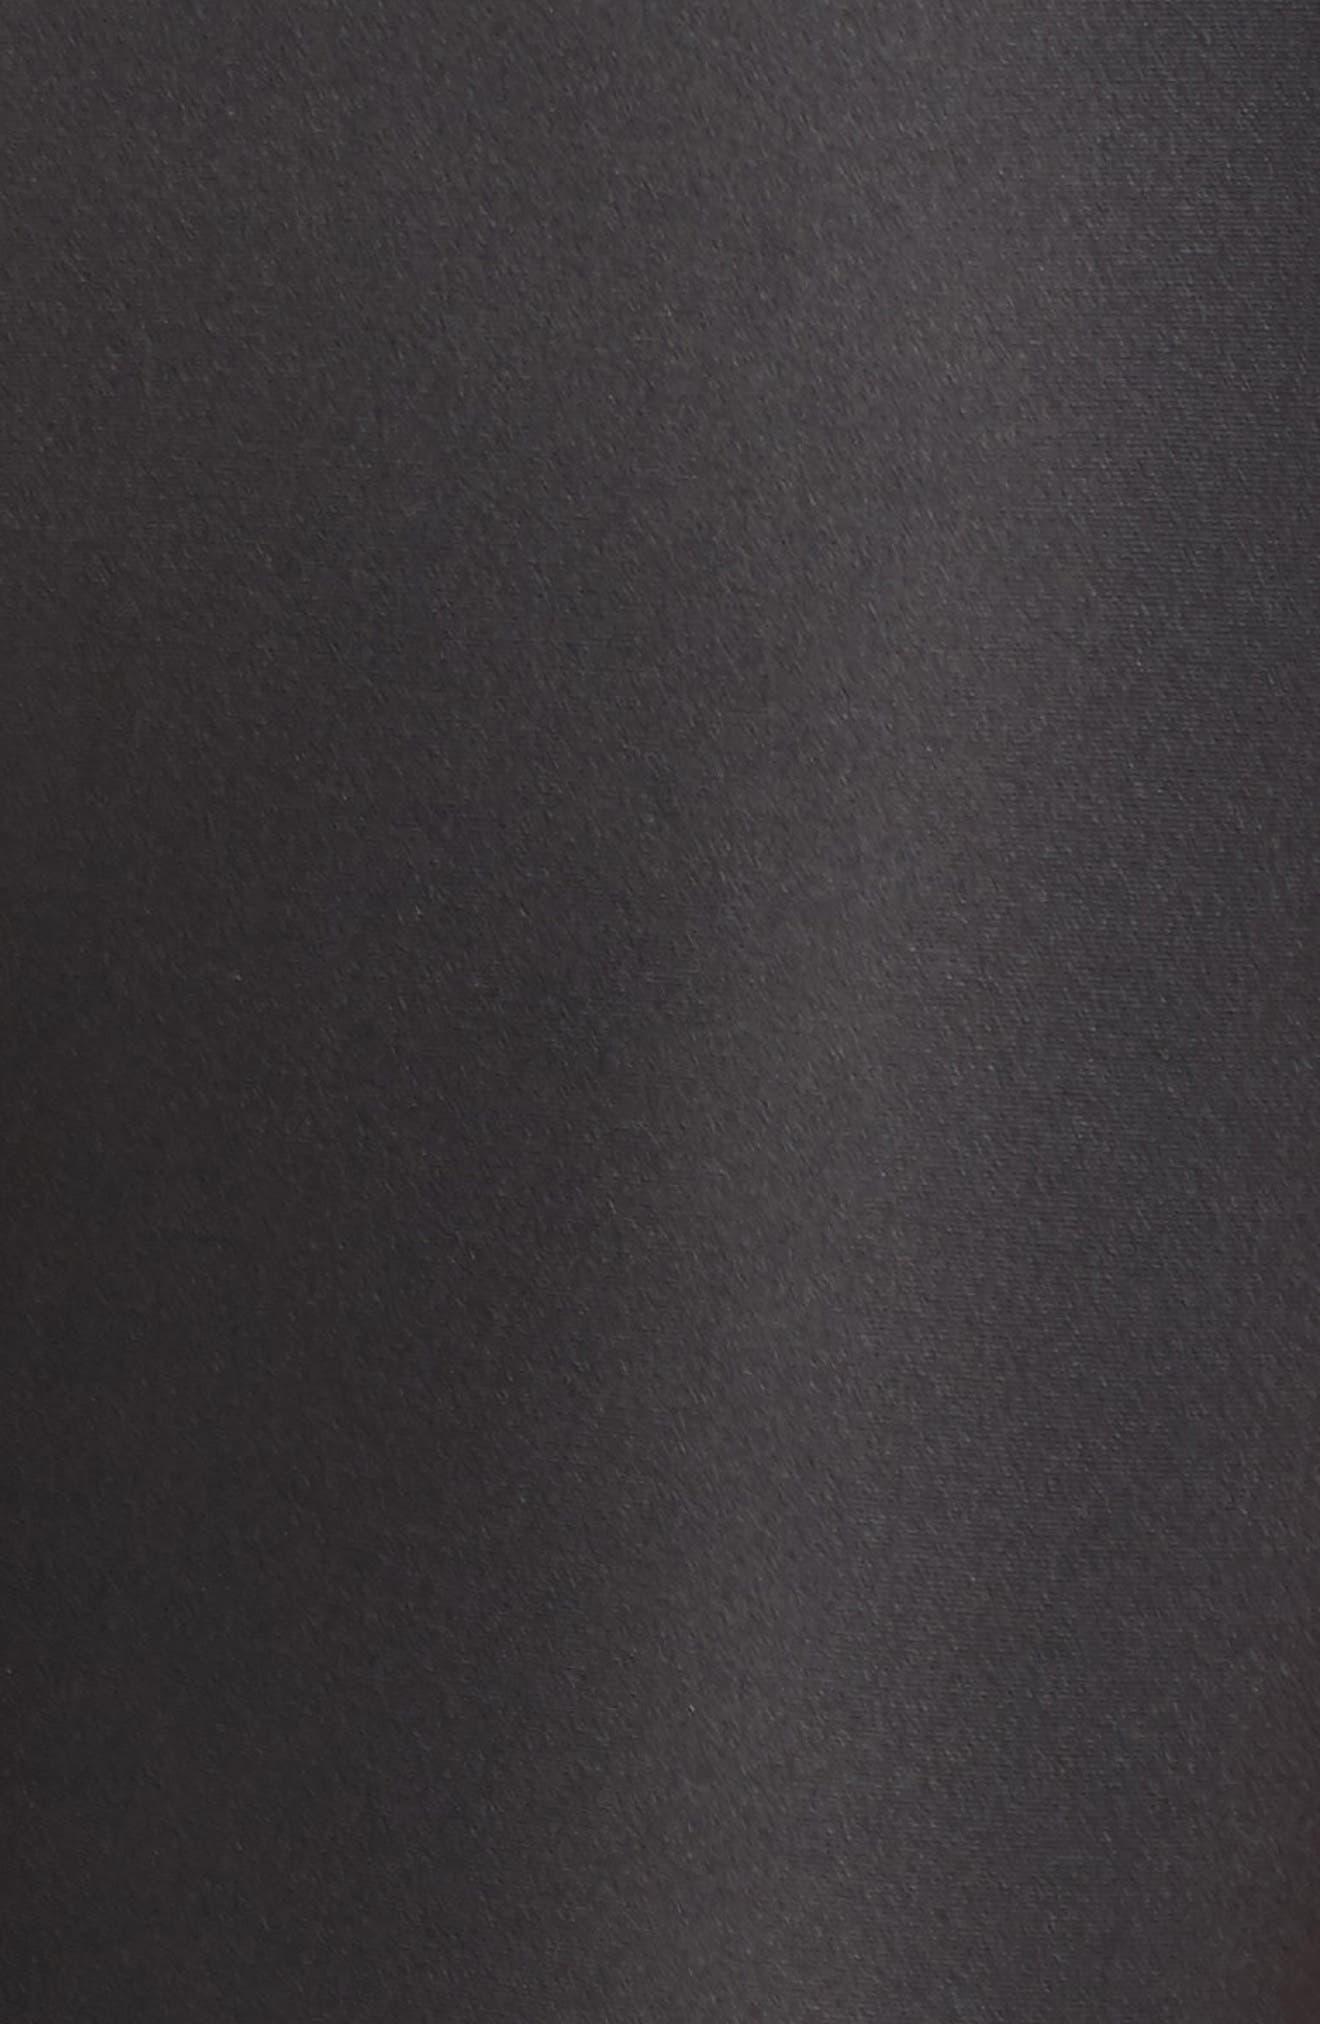 Fade to Black High Waist Leggings,                             Alternate thumbnail 6, color,                             001